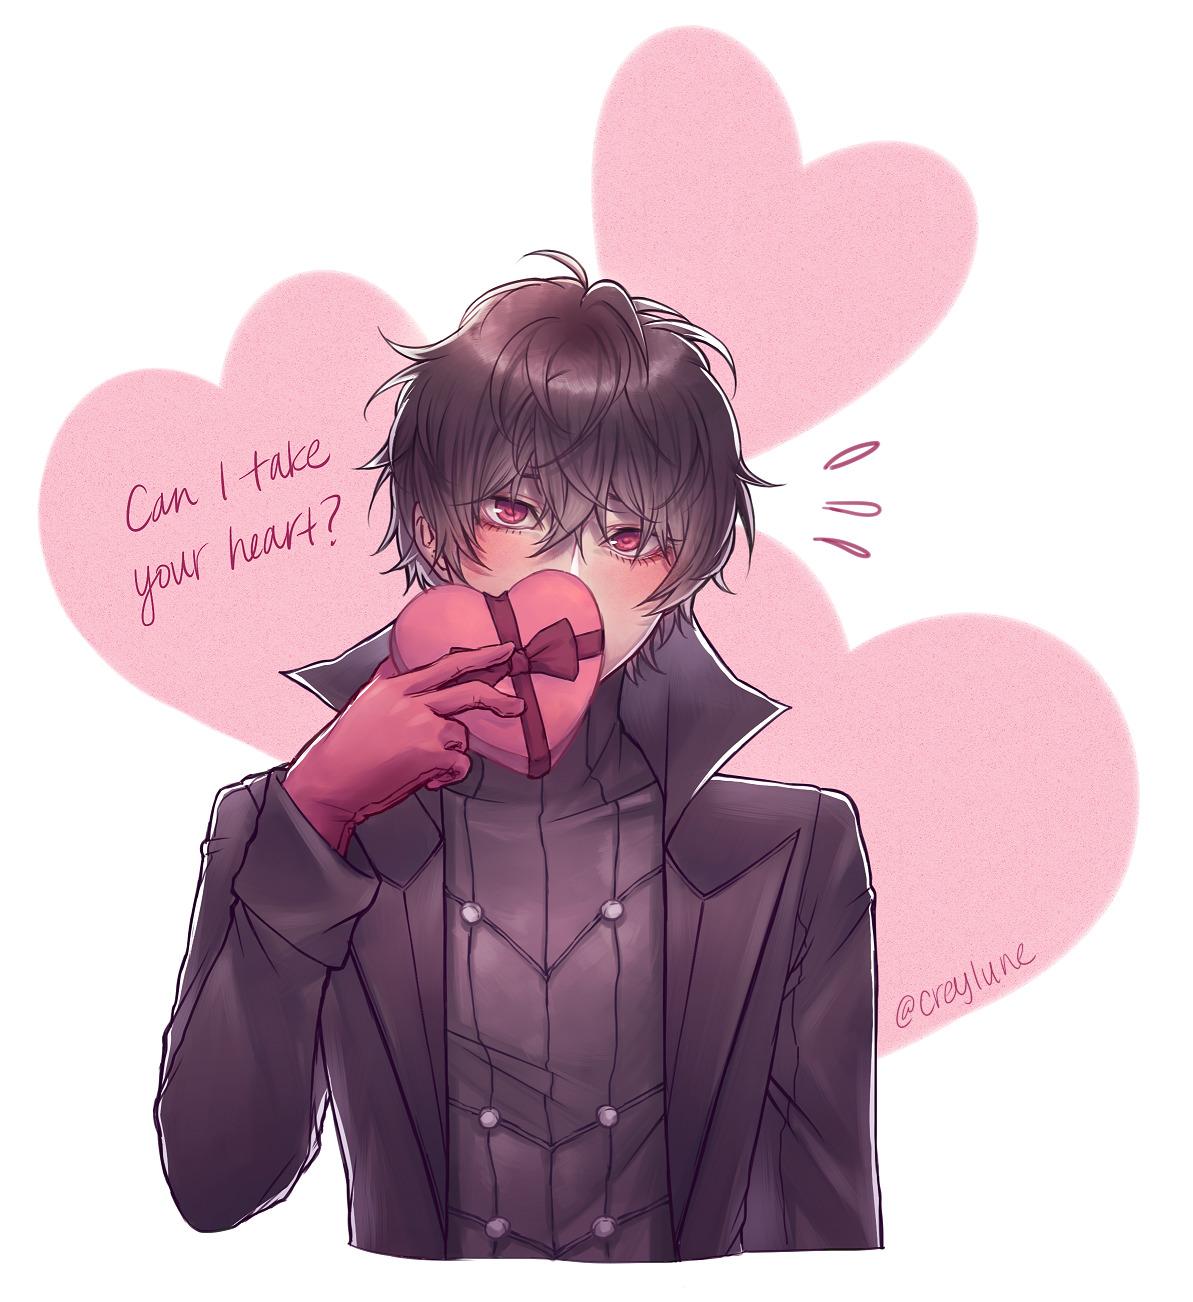 Happy Valentine Everyone Uwu In 2020 Persona 5 Anime Persona 5 Joker Valentines Anime